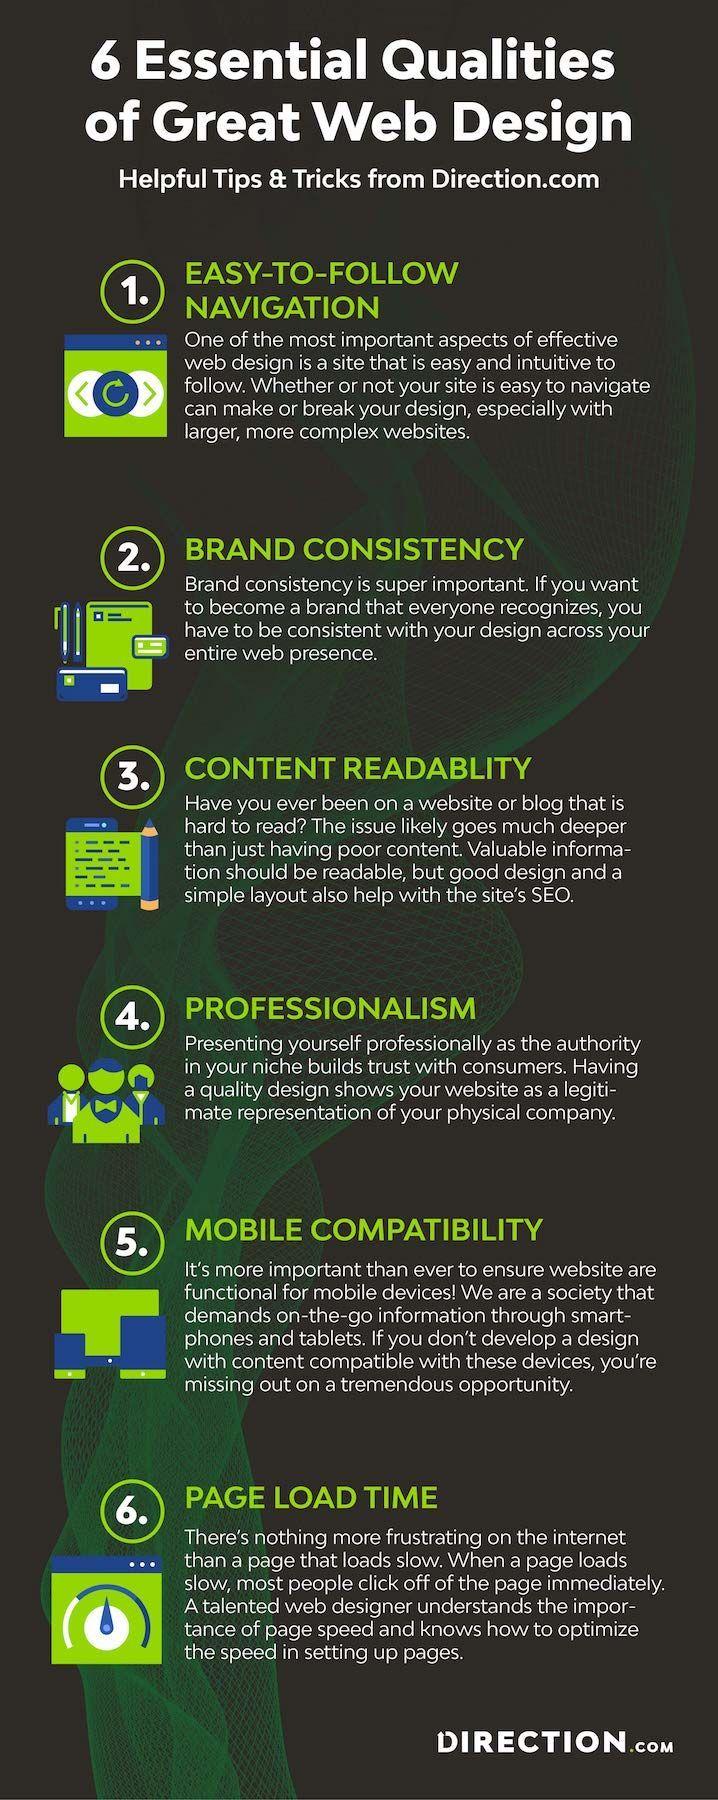 Web Design Websites Essentials Website Tips Website Tricks Create A Website Websitedesign Direction Dire Web Design Great Website Design Website Design